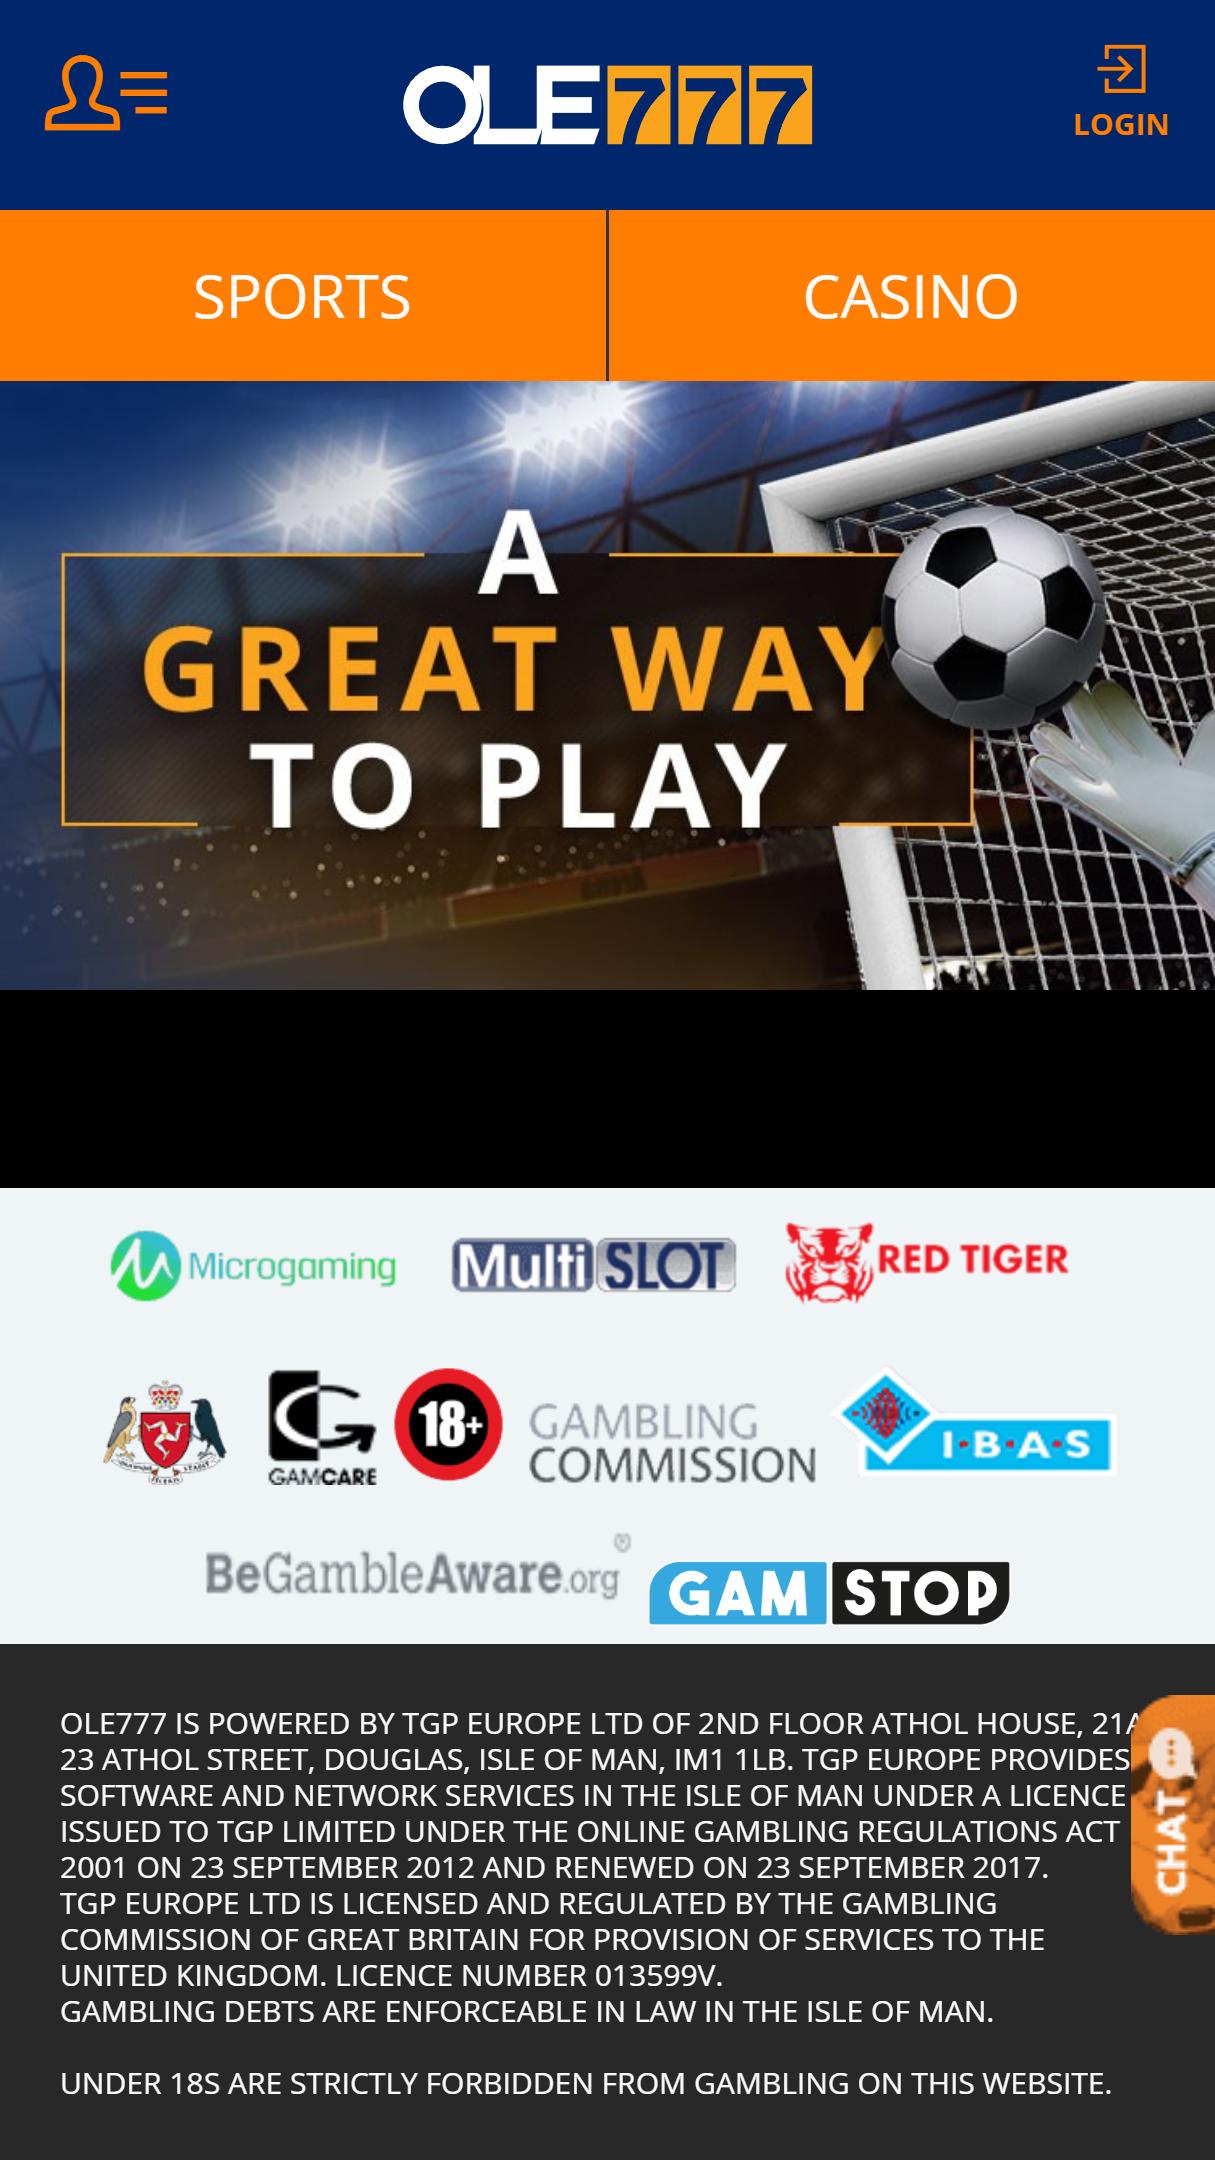 Ole777 Casino App Homepage